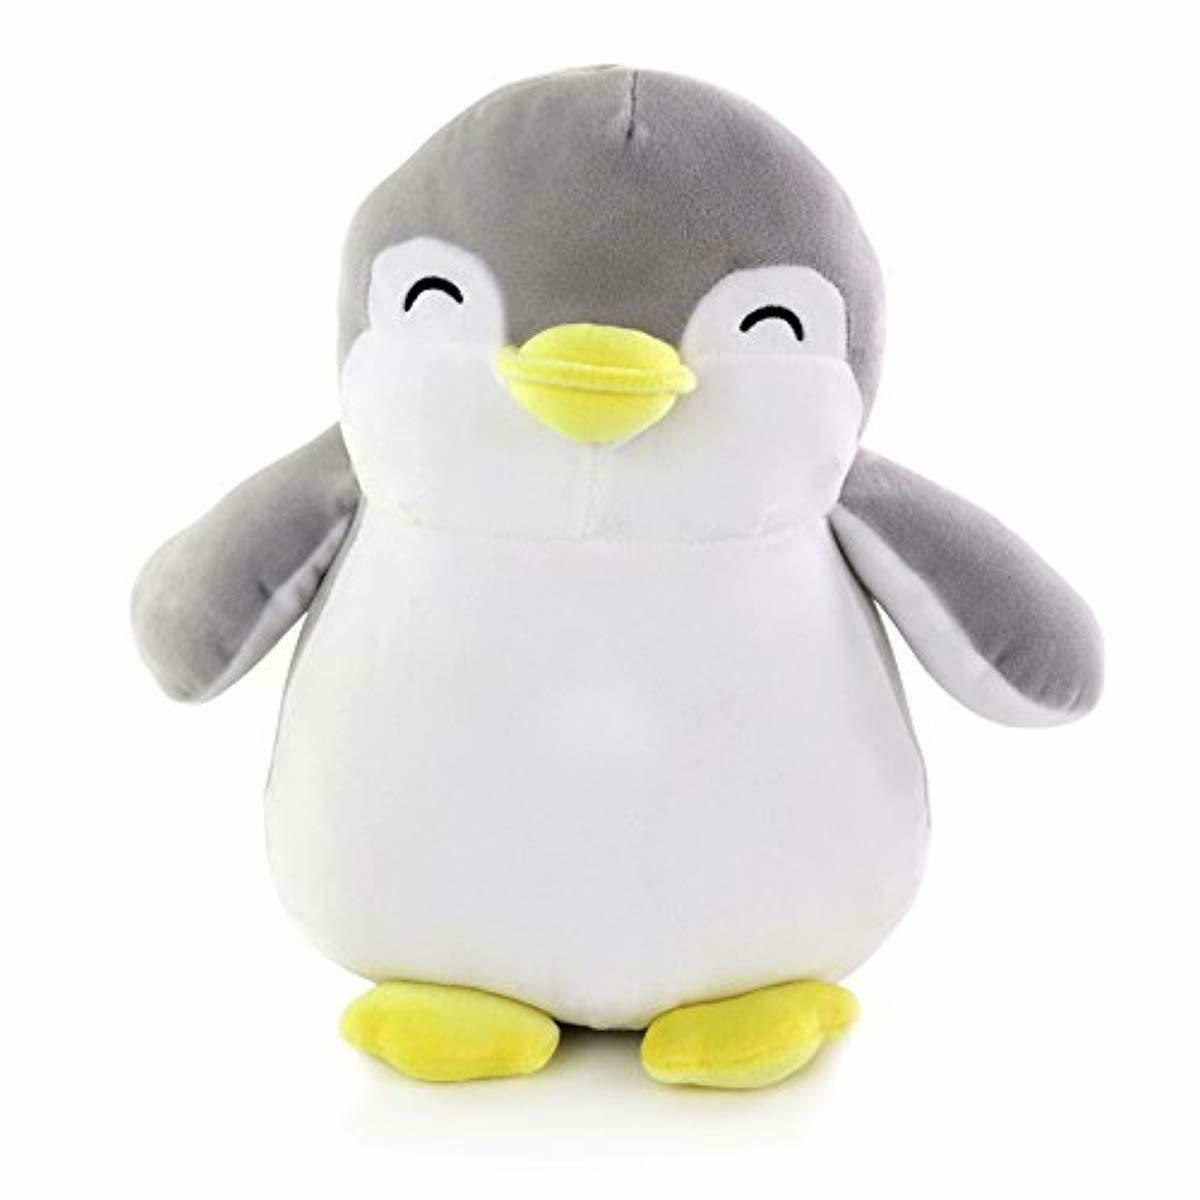 penguin stuffed animals squeezable plush penguin toys